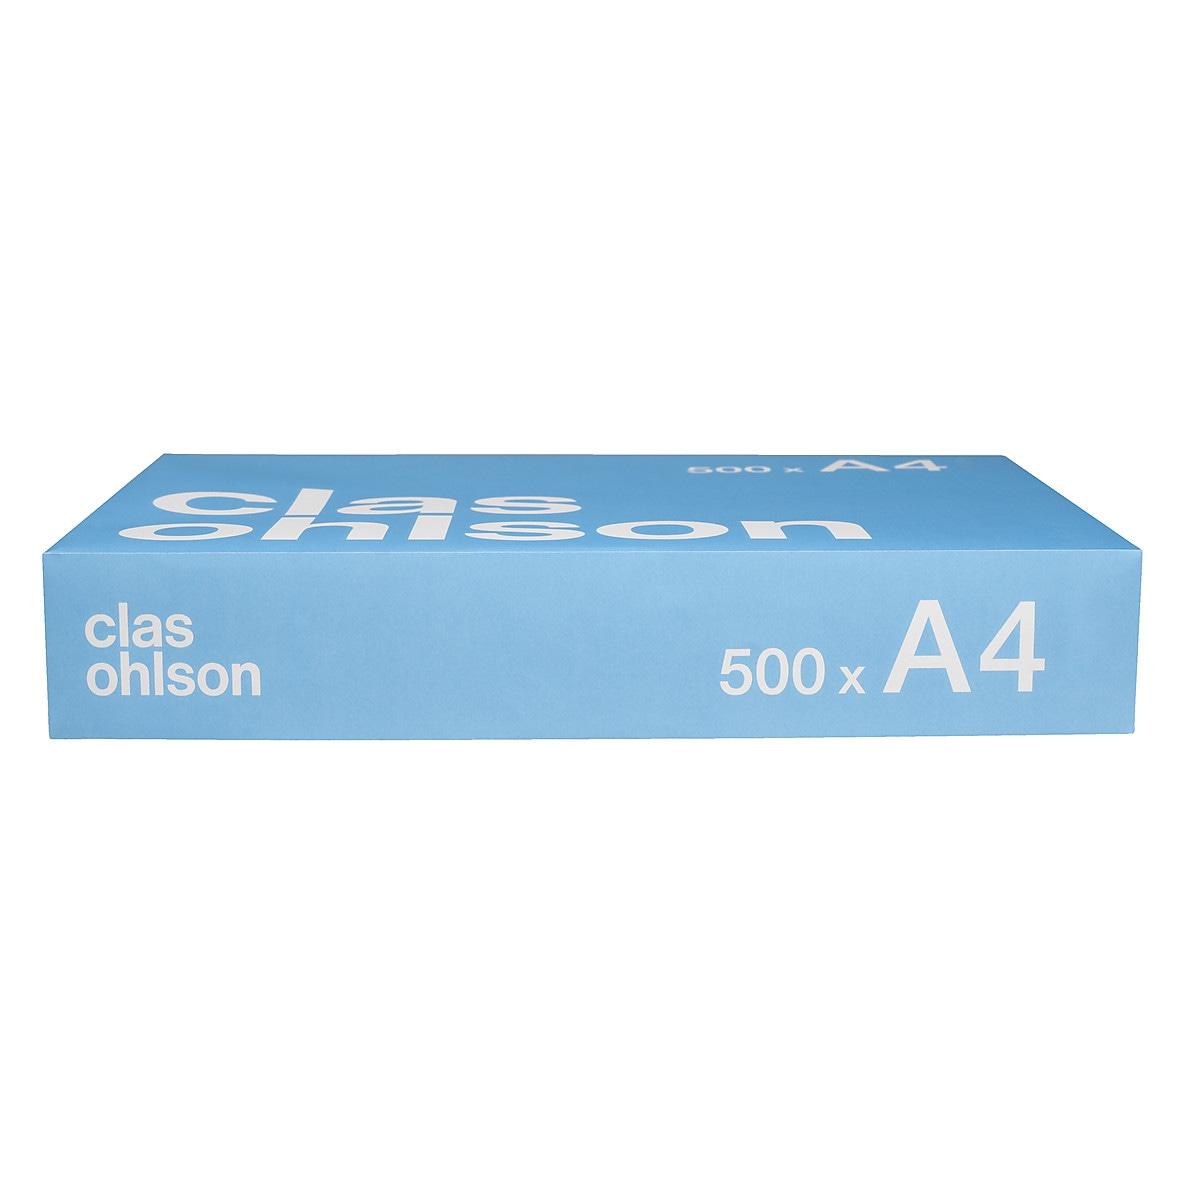 Clas Ohlson A4 Printer Paper